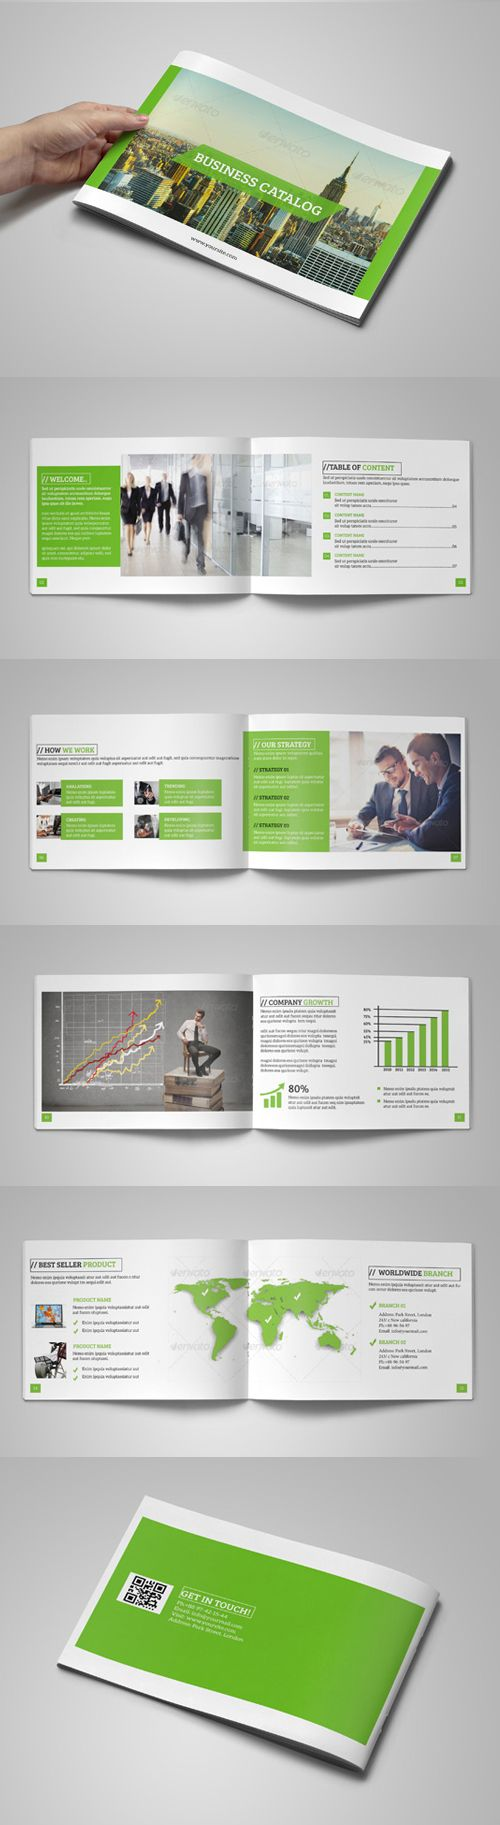 Construction Company Brochure   Brochure template, Brochures and ...